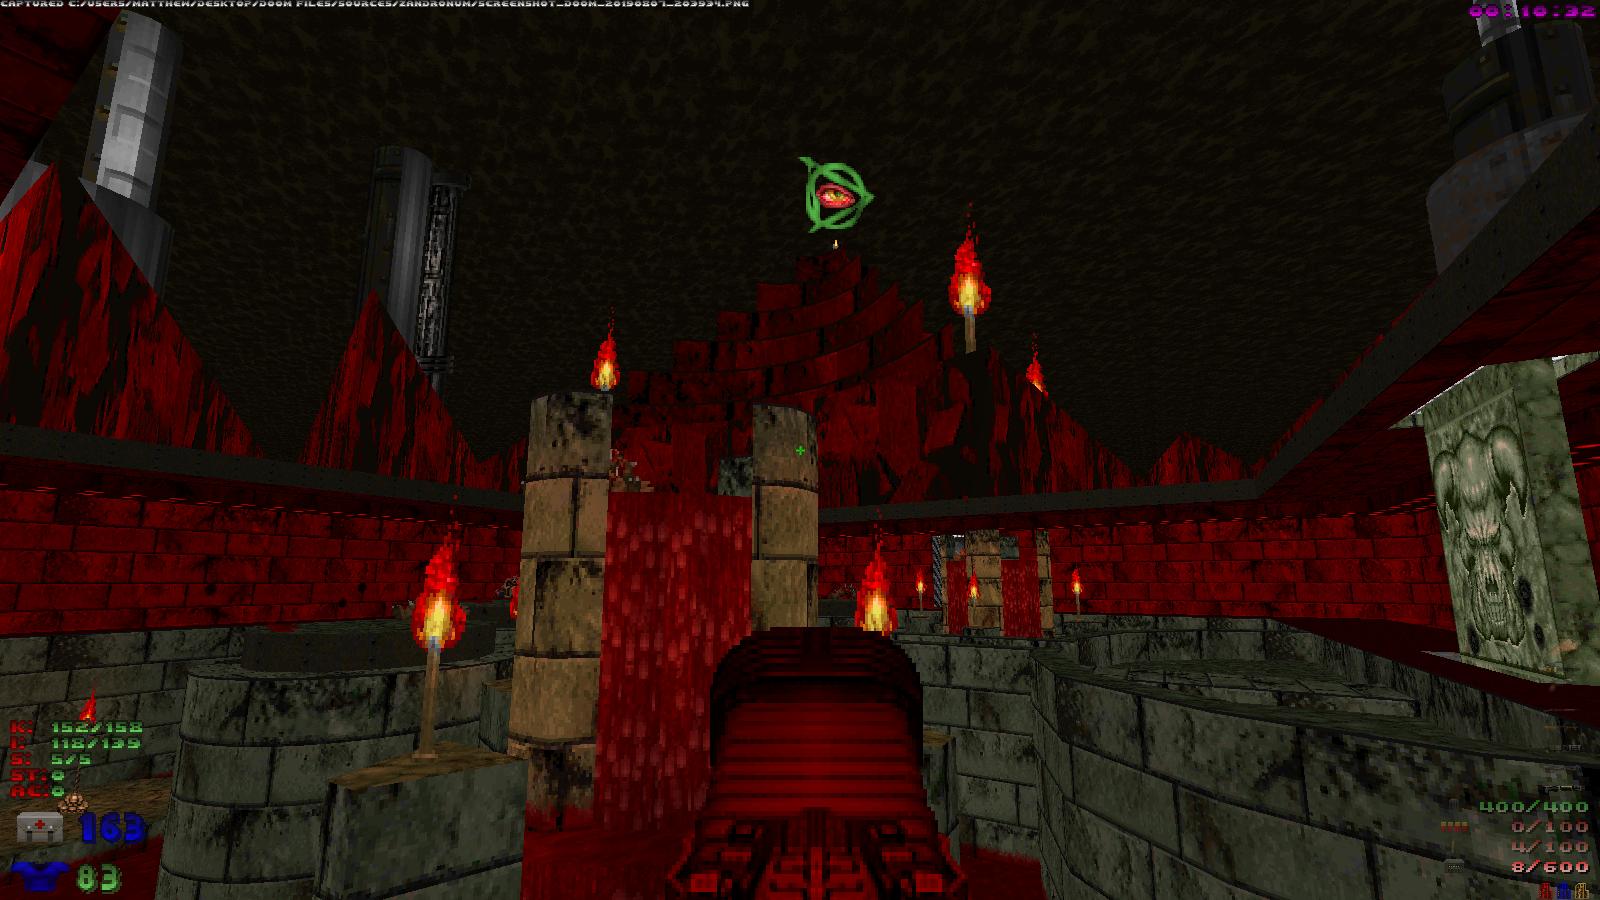 Screenshot_Doom_20190807_203937.png.ba15b9c8db79f05a645d0c1040b3538c.png